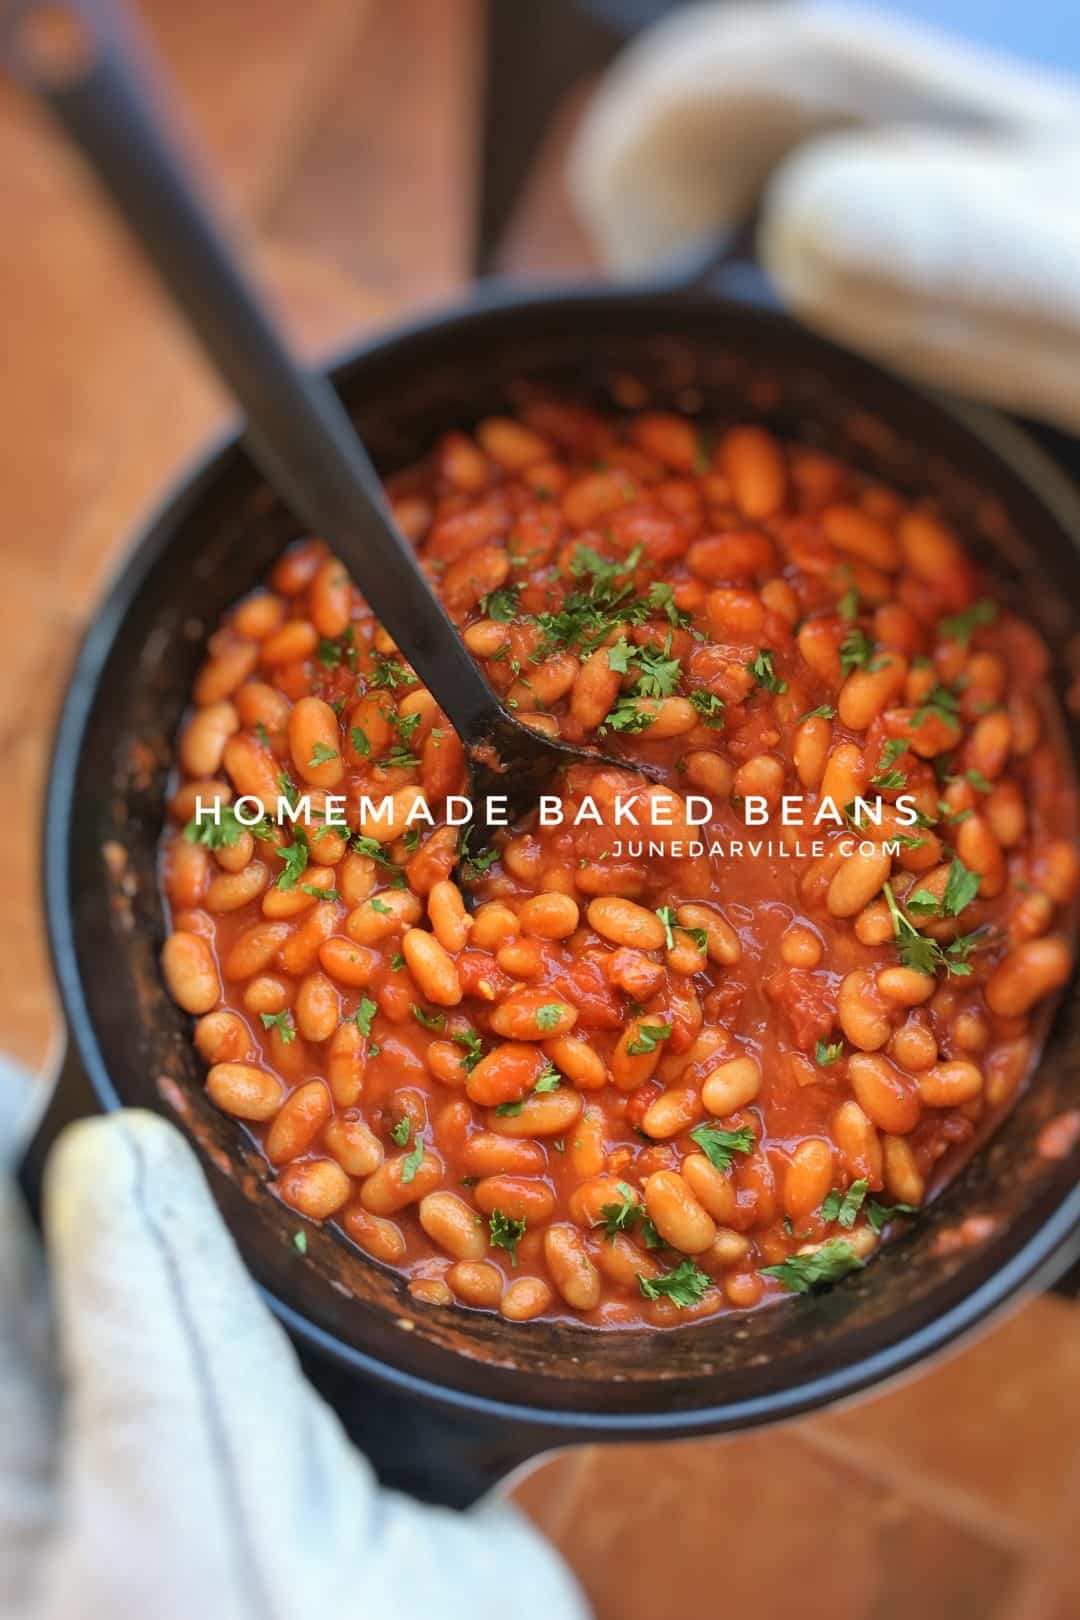 Best Oven Baked Beans Recipe Simple Tasty Good